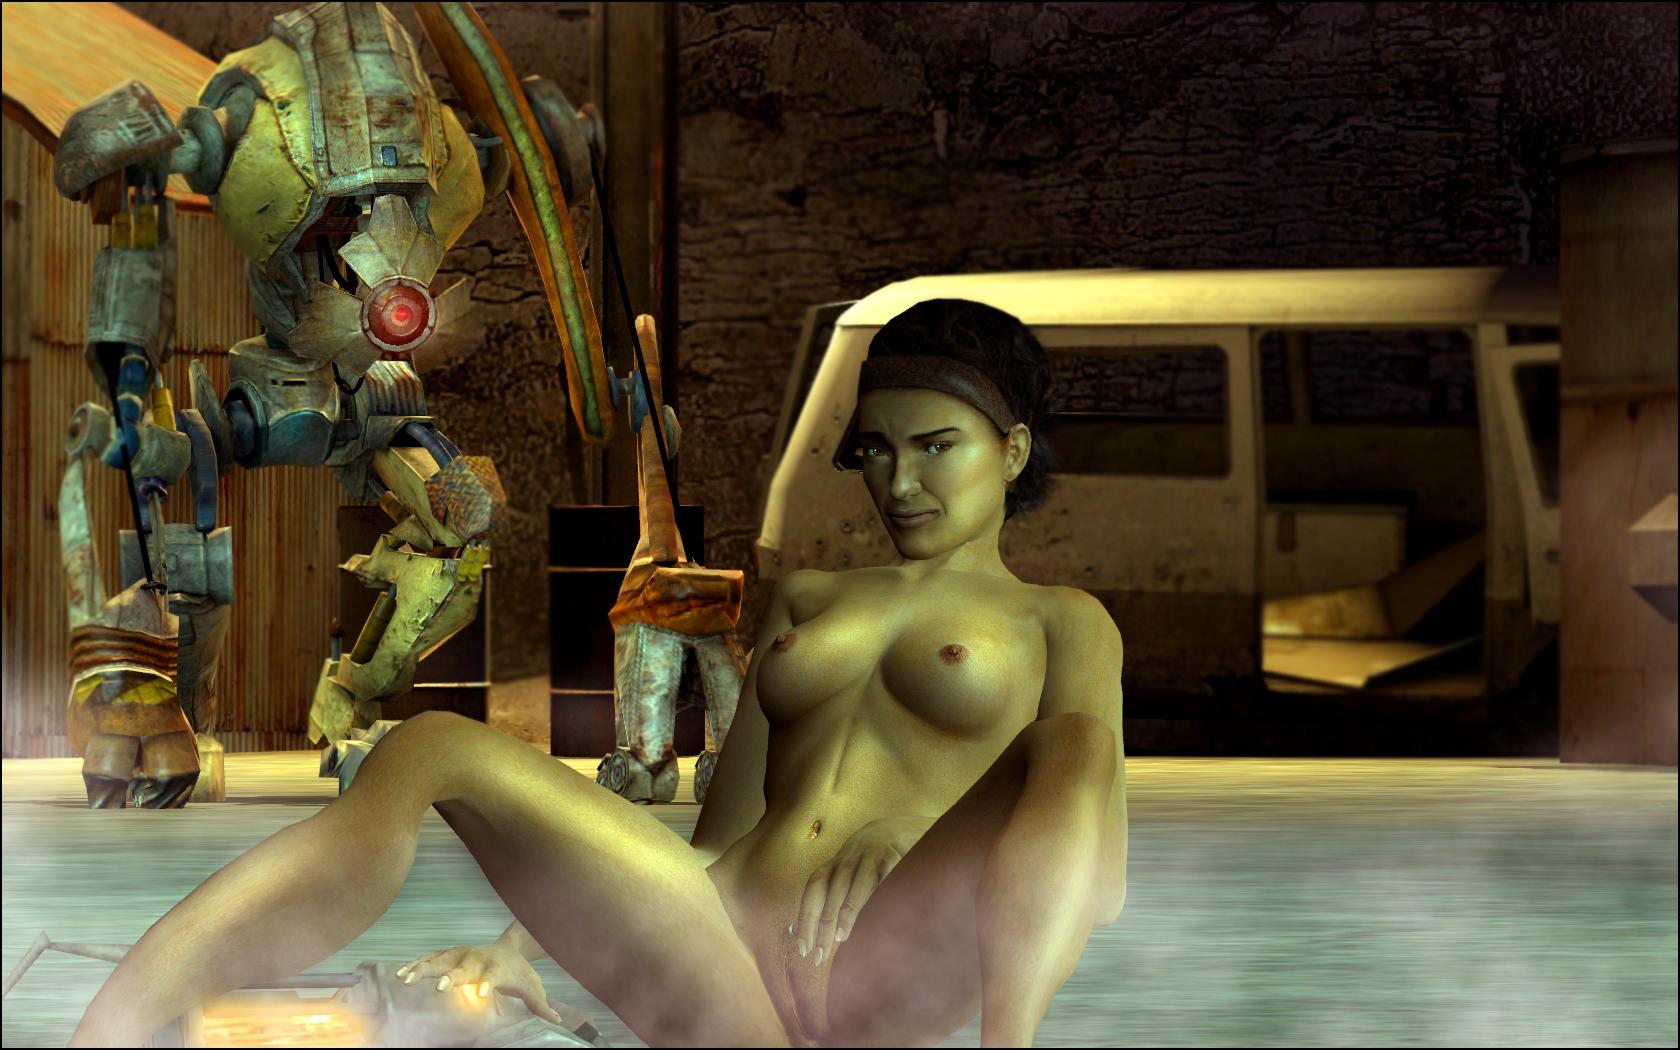 mod 4 nude glorious fallout female Oda nobuna no yabou.